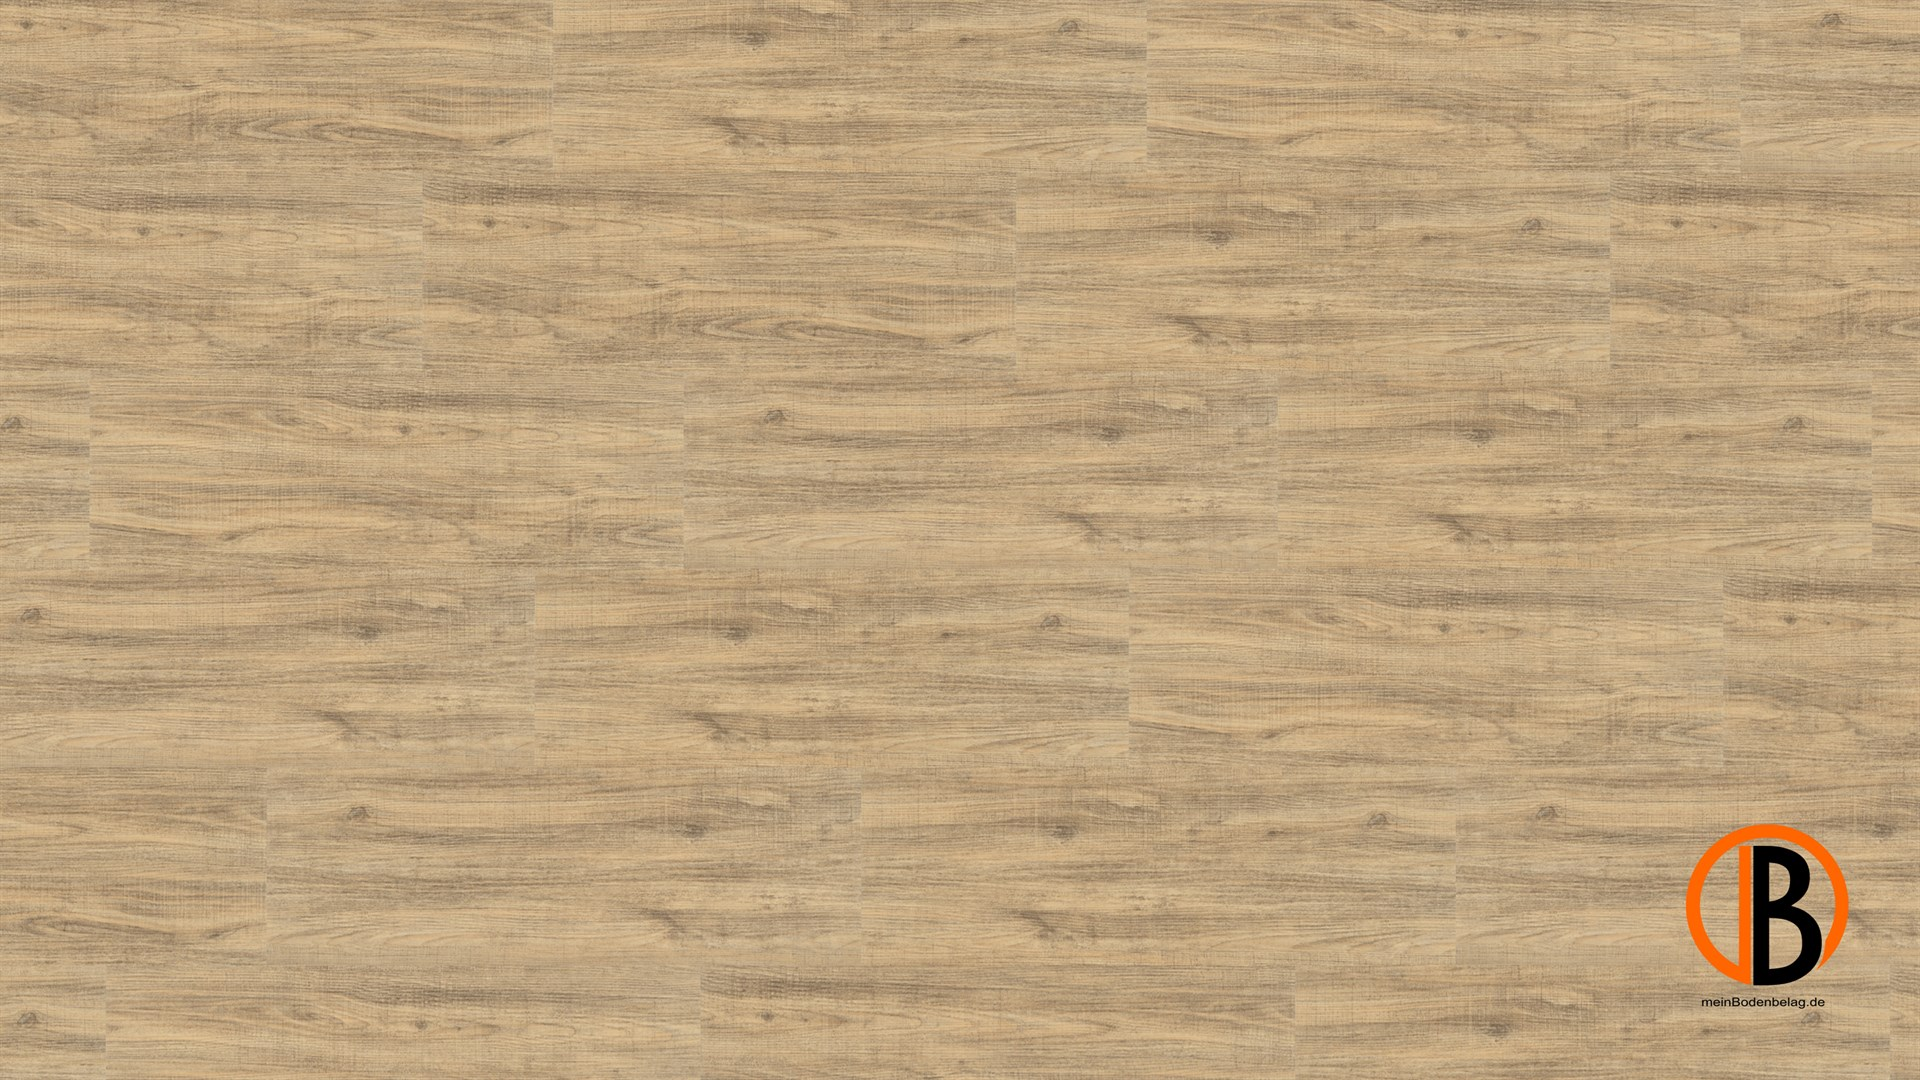 CINQUE KWG DESIGNERVINYL ANTIGUA CLASSIC SHEETS | 10000252;0 | Bild 1